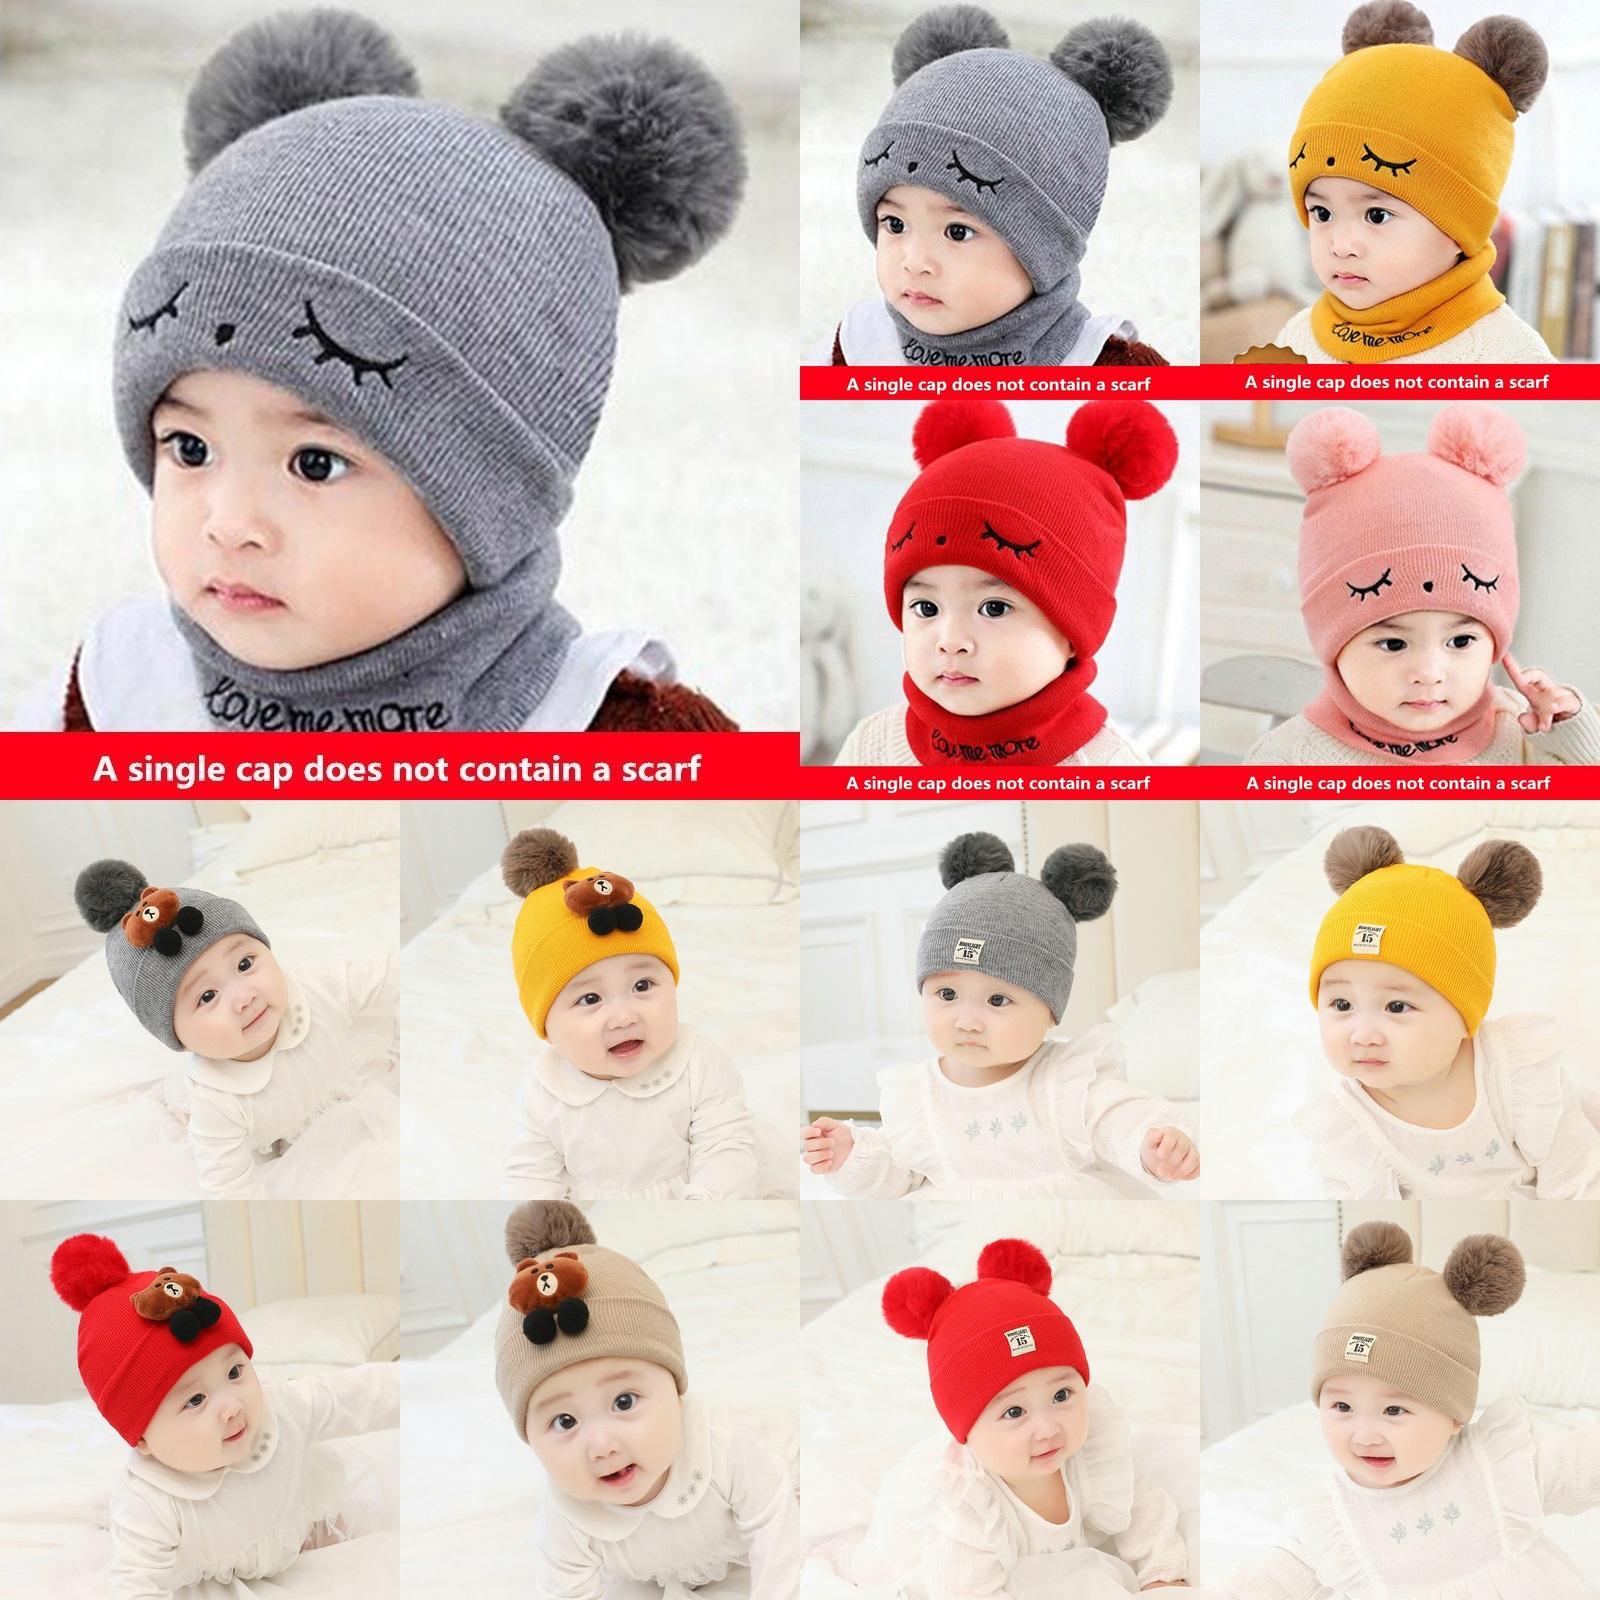 Children Hat Toddler Kids Baby Warm Winter Wool Hat Knit Beanie Neck warmers Baby Boys Girls 3 months to 2 years old